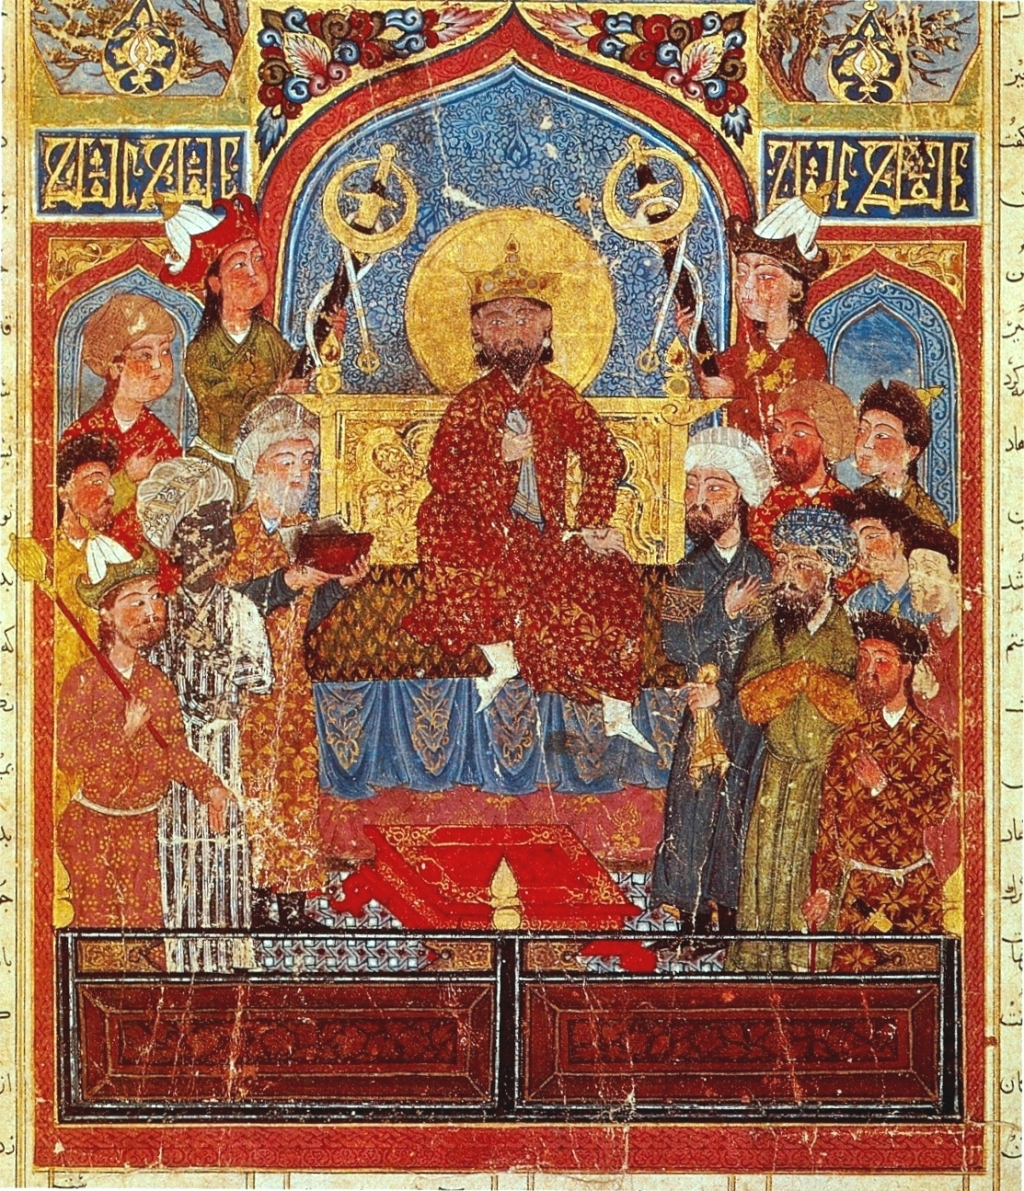 Shahname -Il.lustració del Shahnameh Demotte, Museu del Louvre